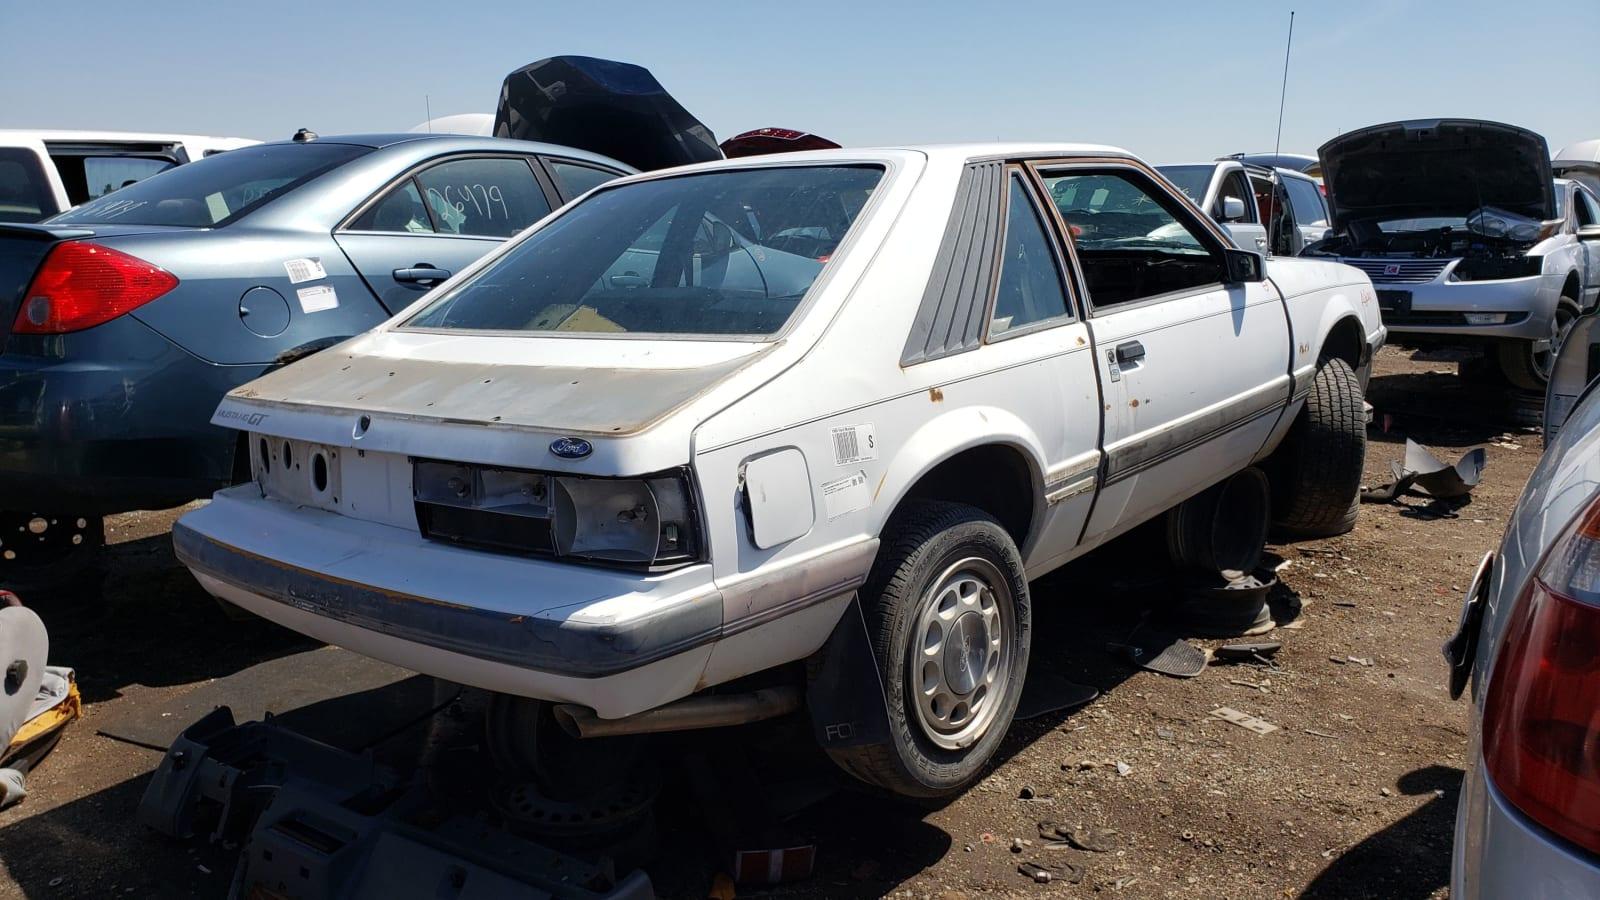 Schrottplatzjuwel: 1985 Ford Mustang GT€